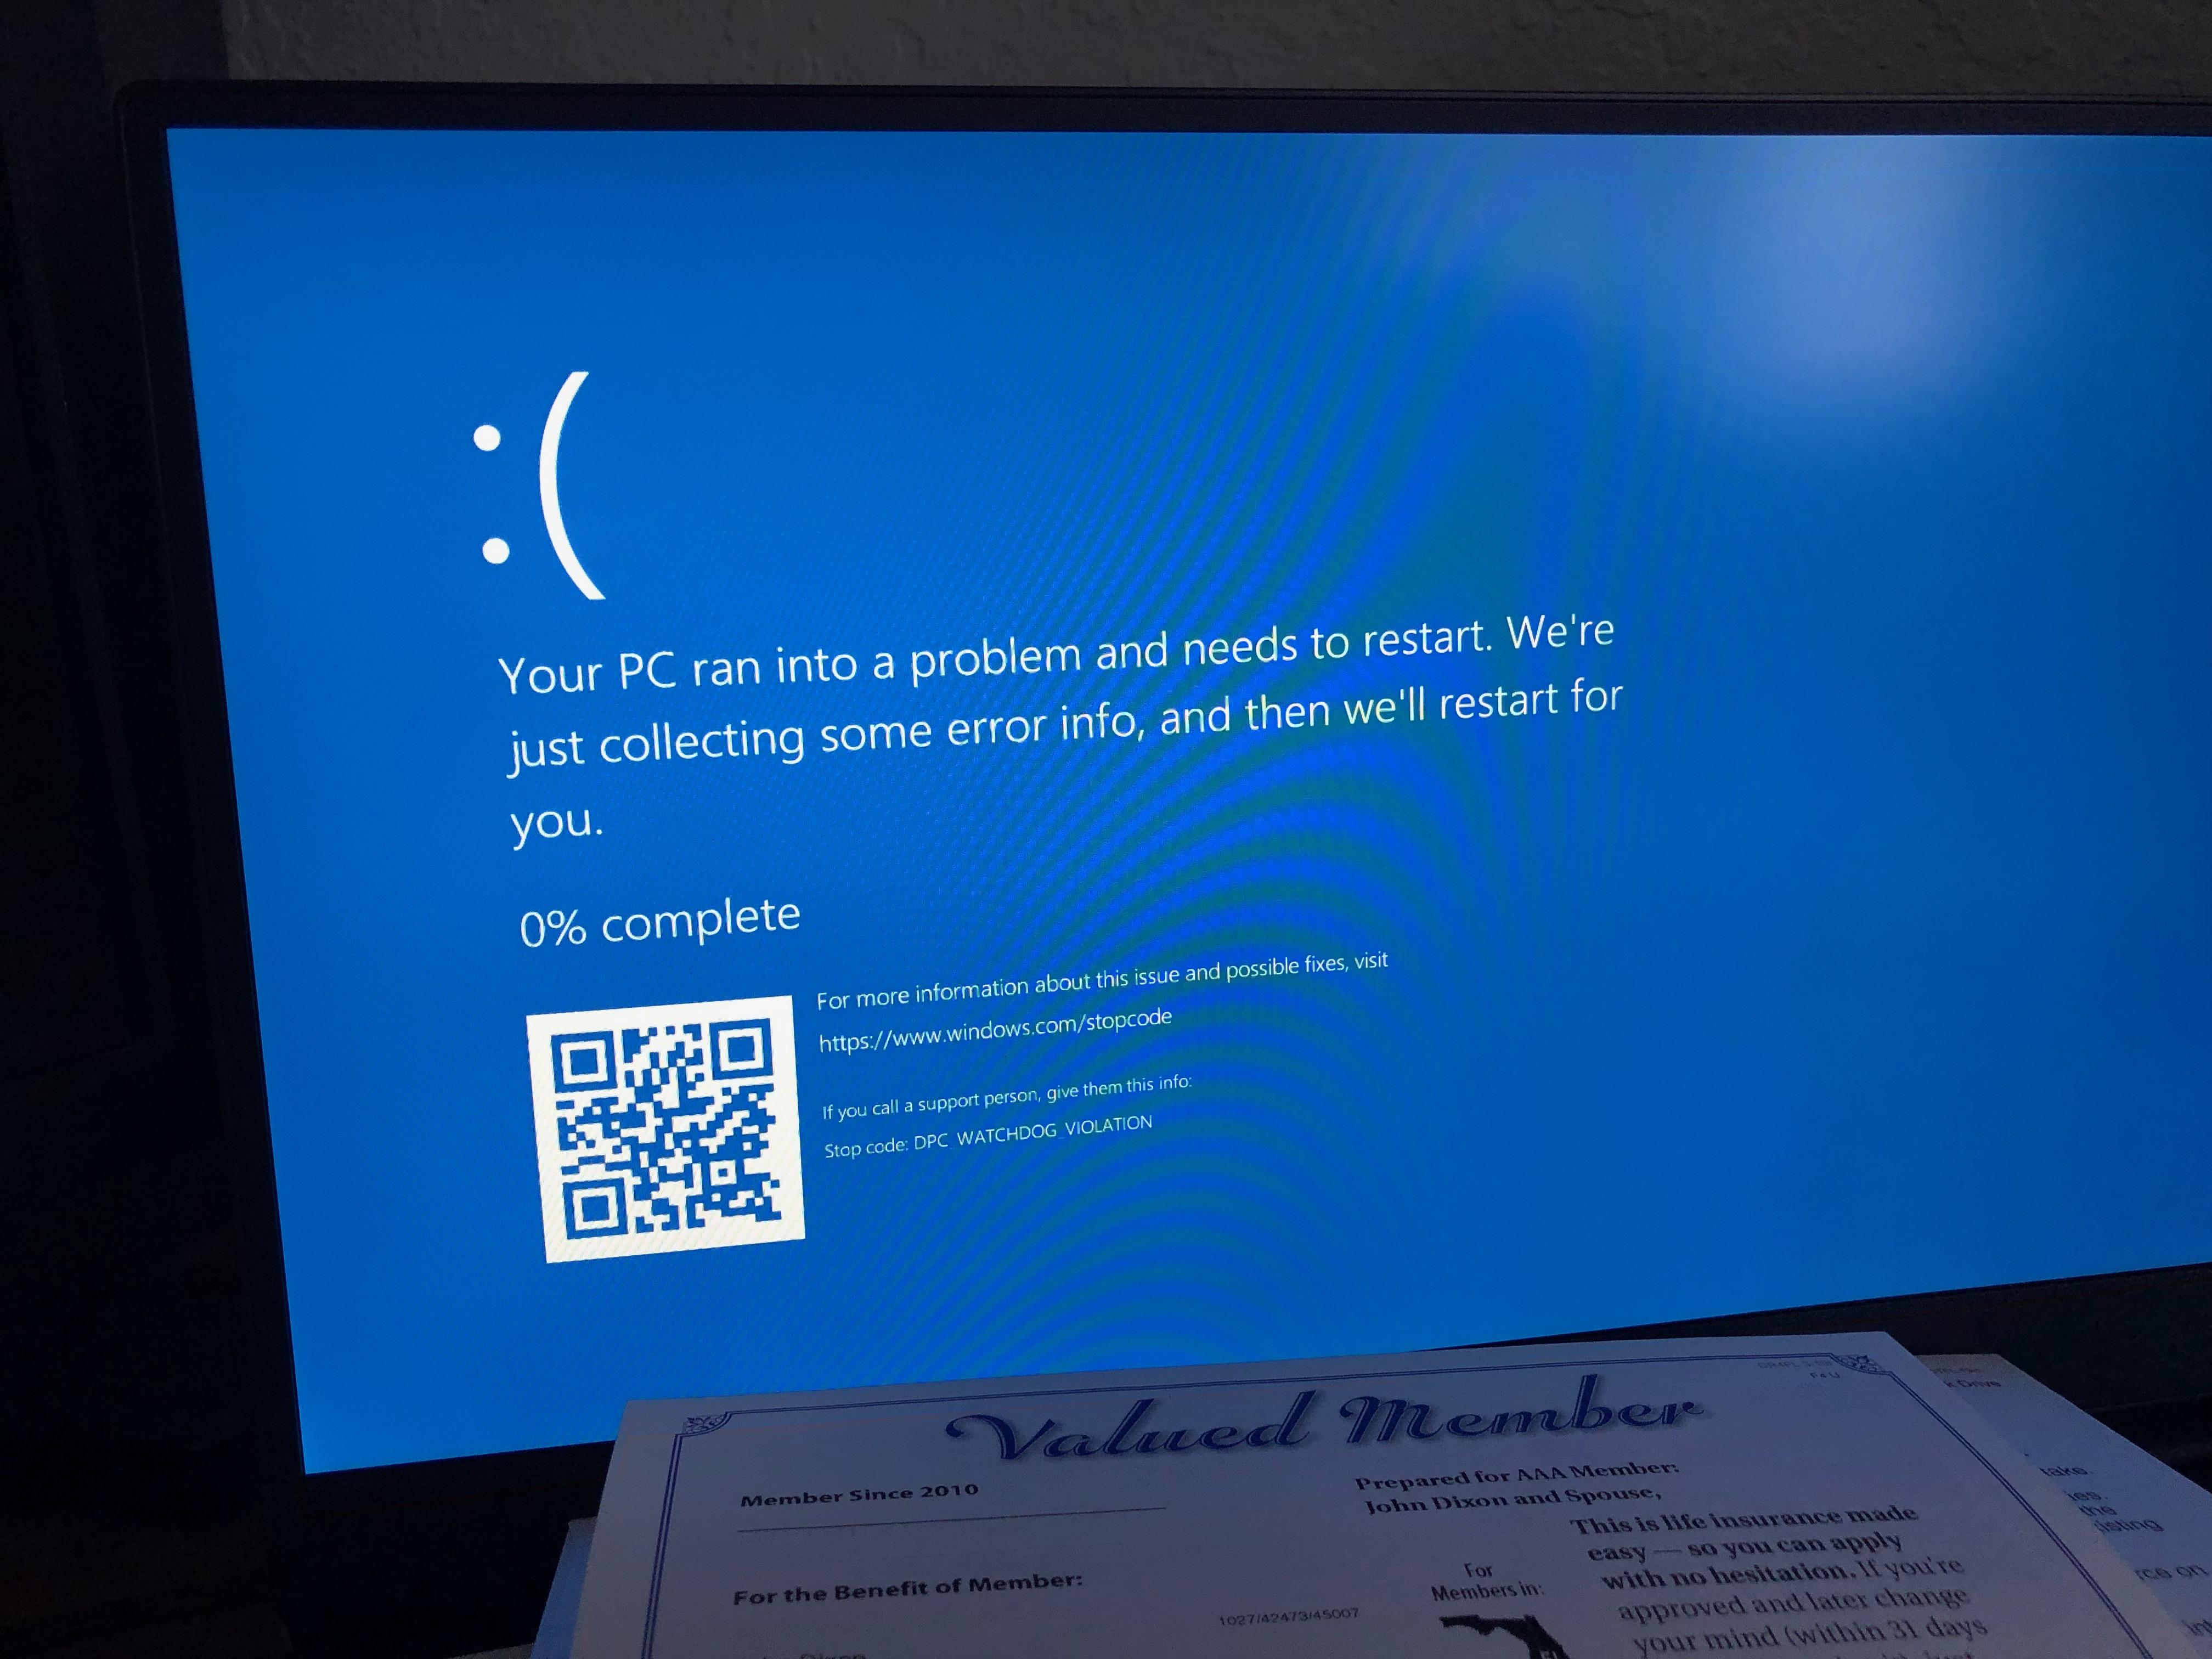 dpc watchdog violation windows 10 dell xps